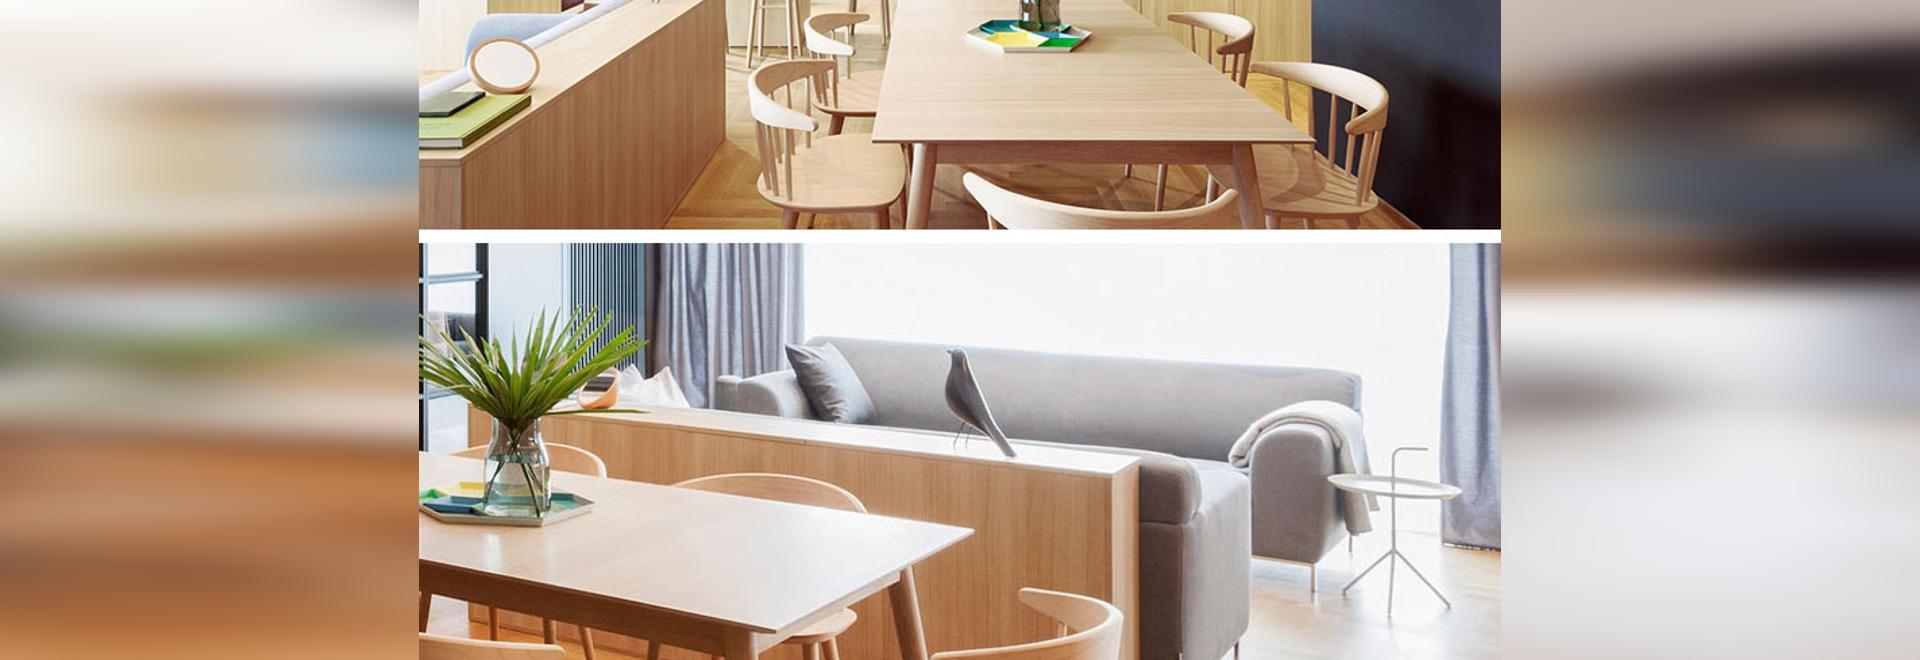 Apartment Interior Design Idea – Build A Small Wall As A Room Divider